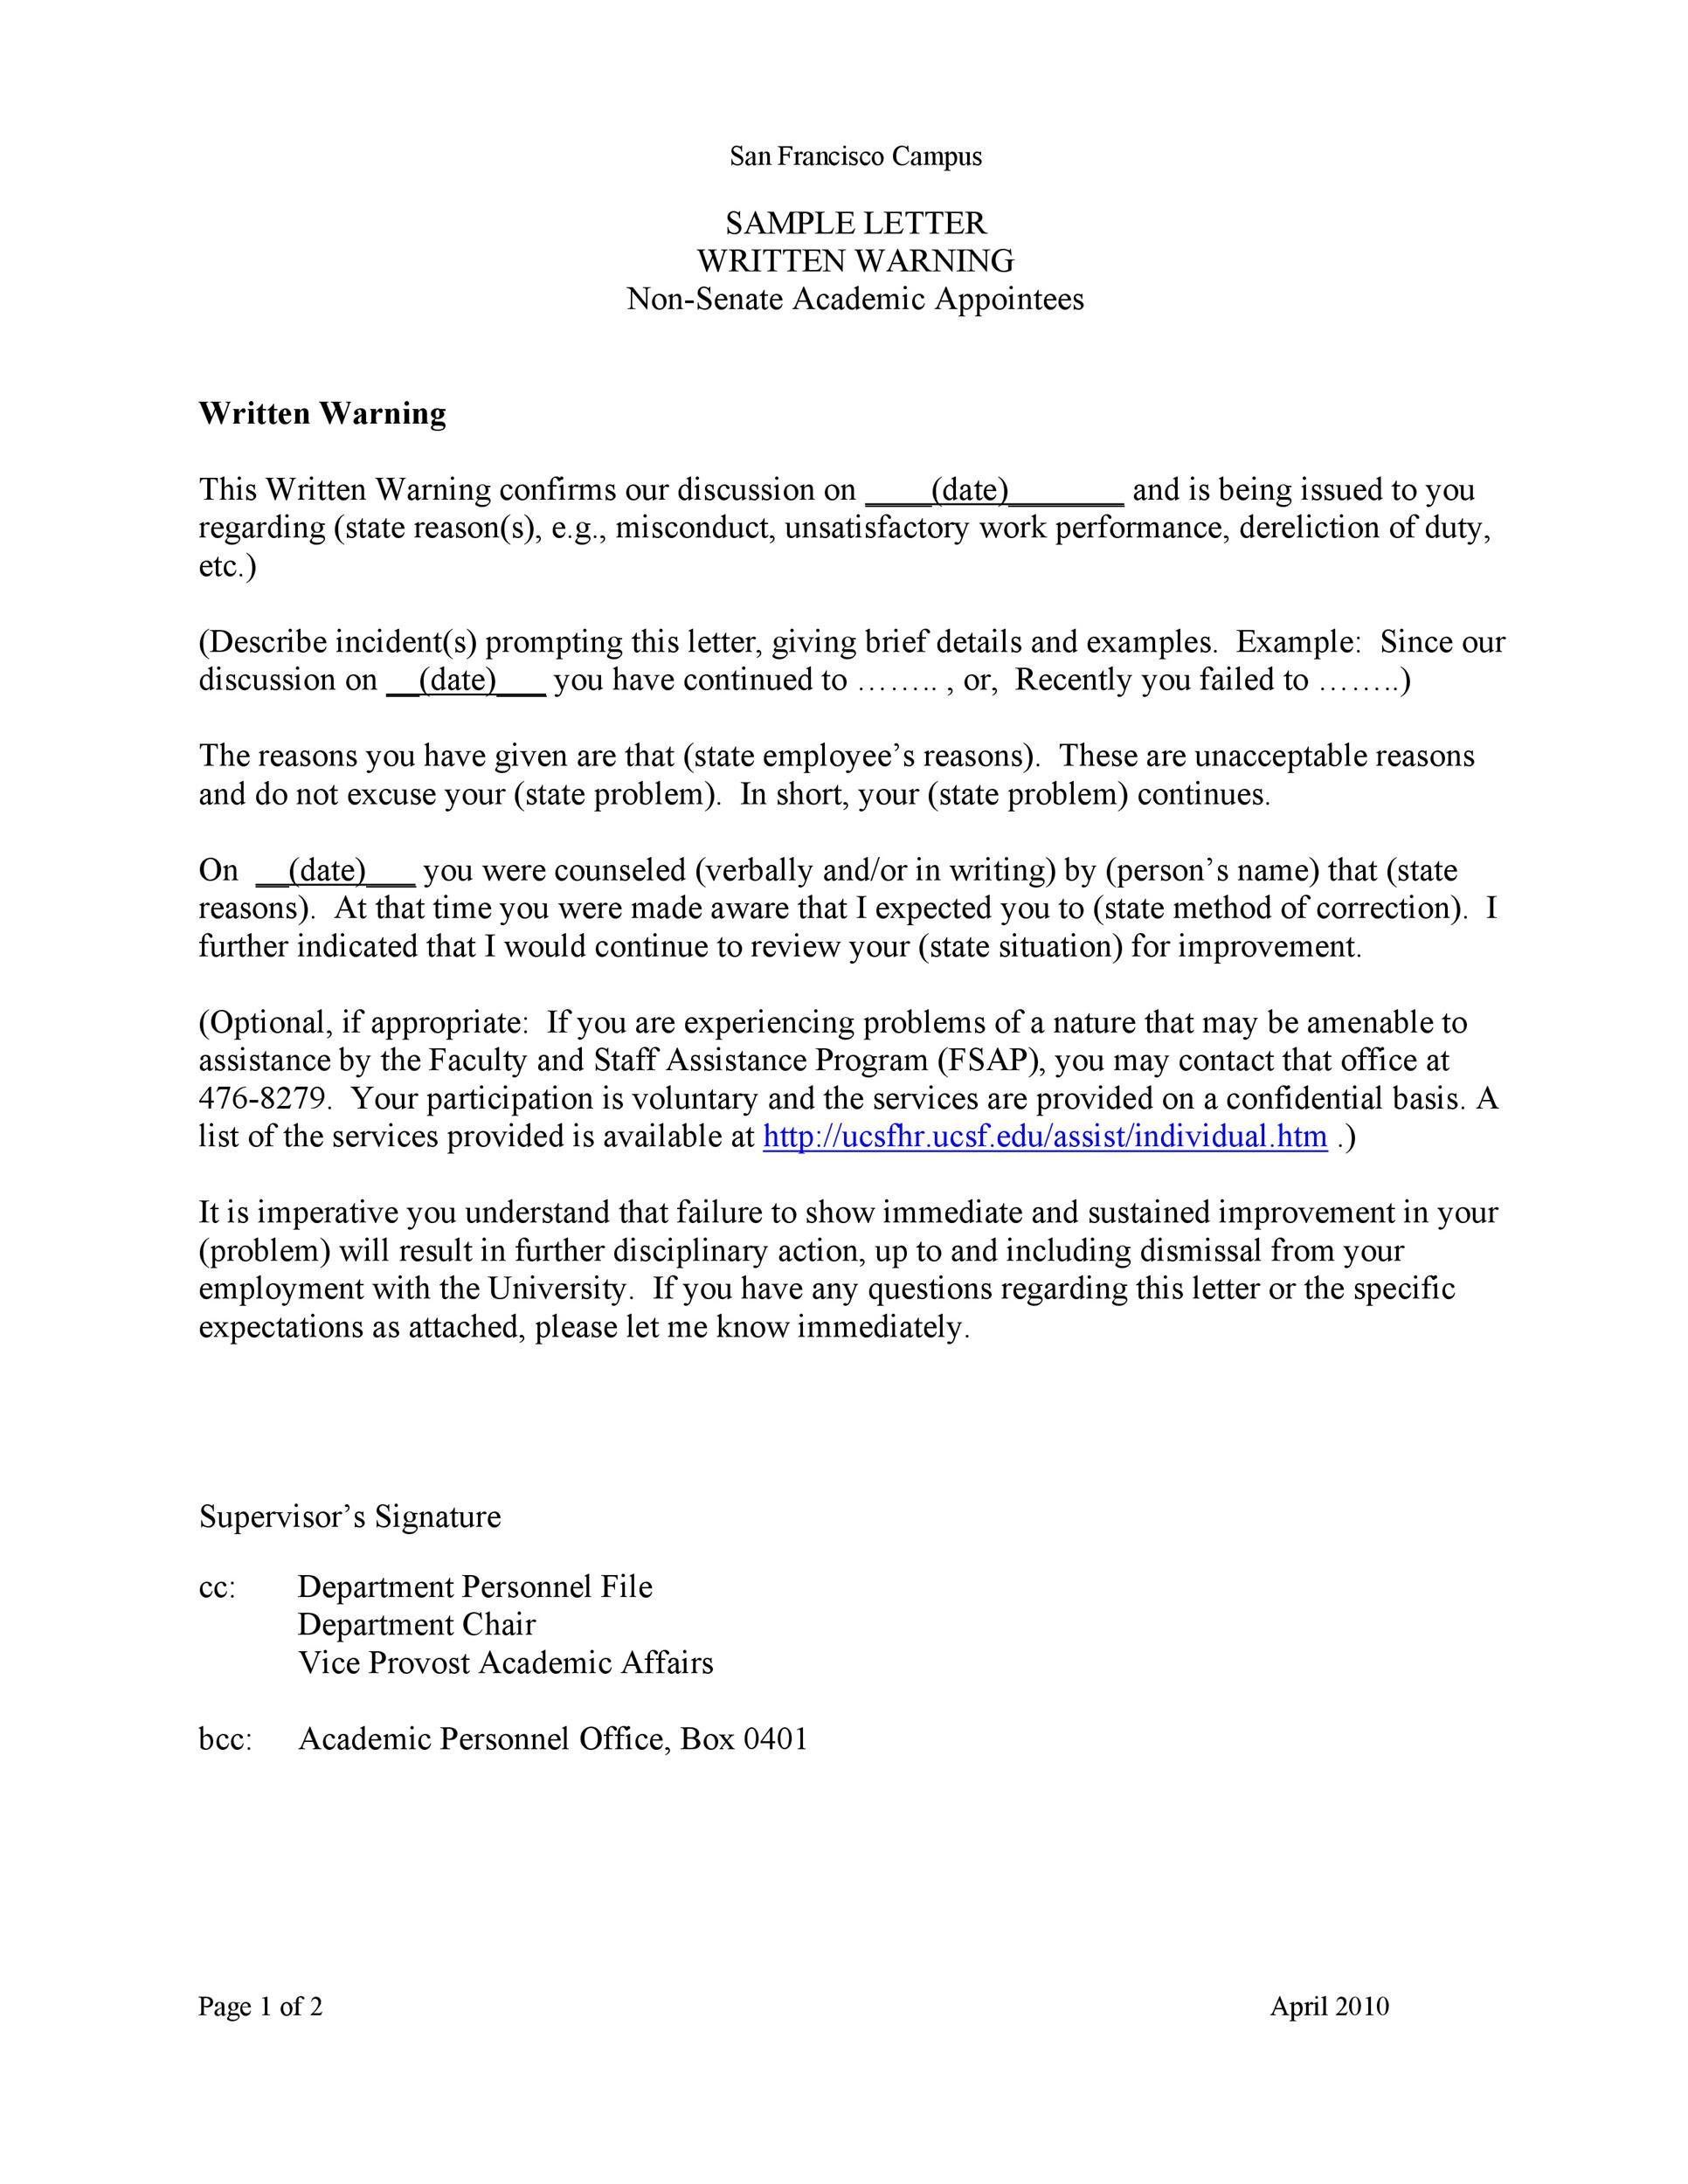 Free employee warning letter 03